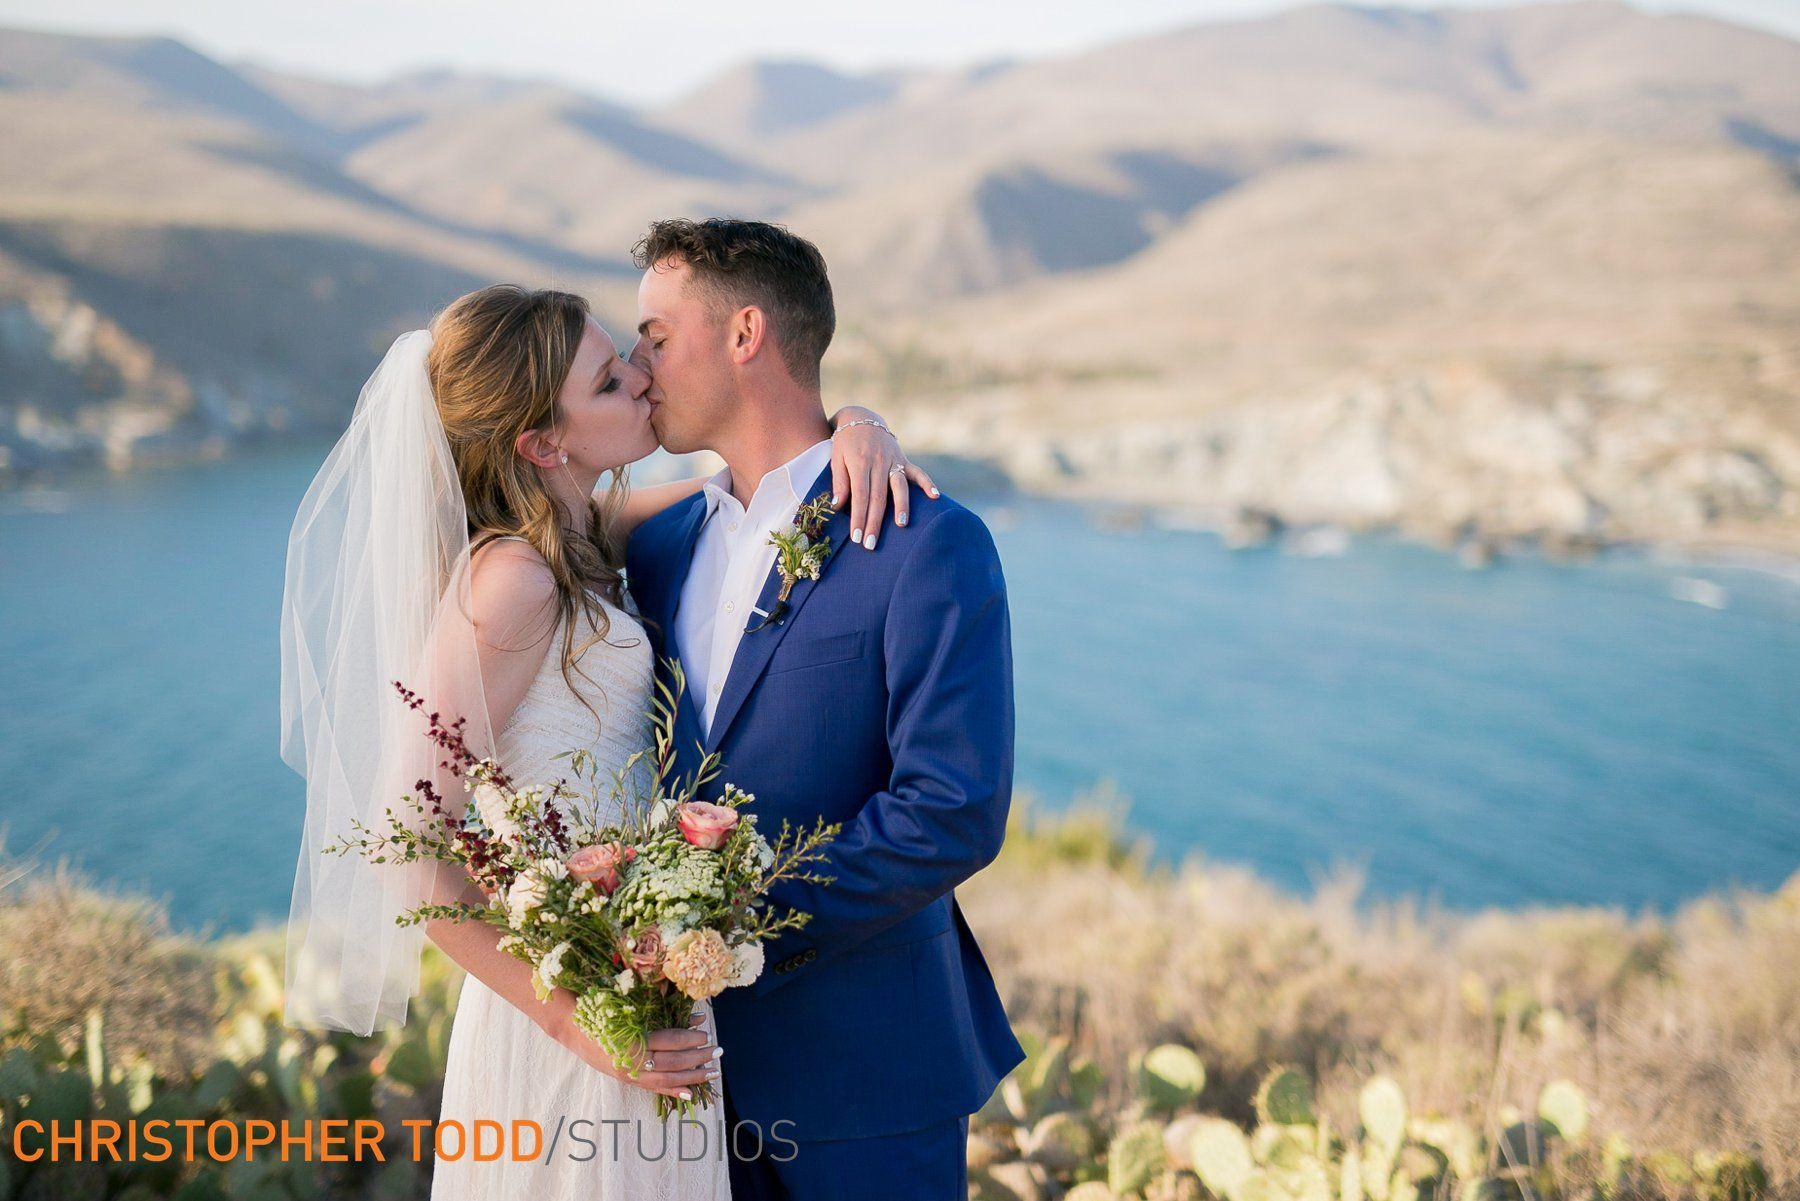 Catalina Island Elopement Island weddings, Wedding